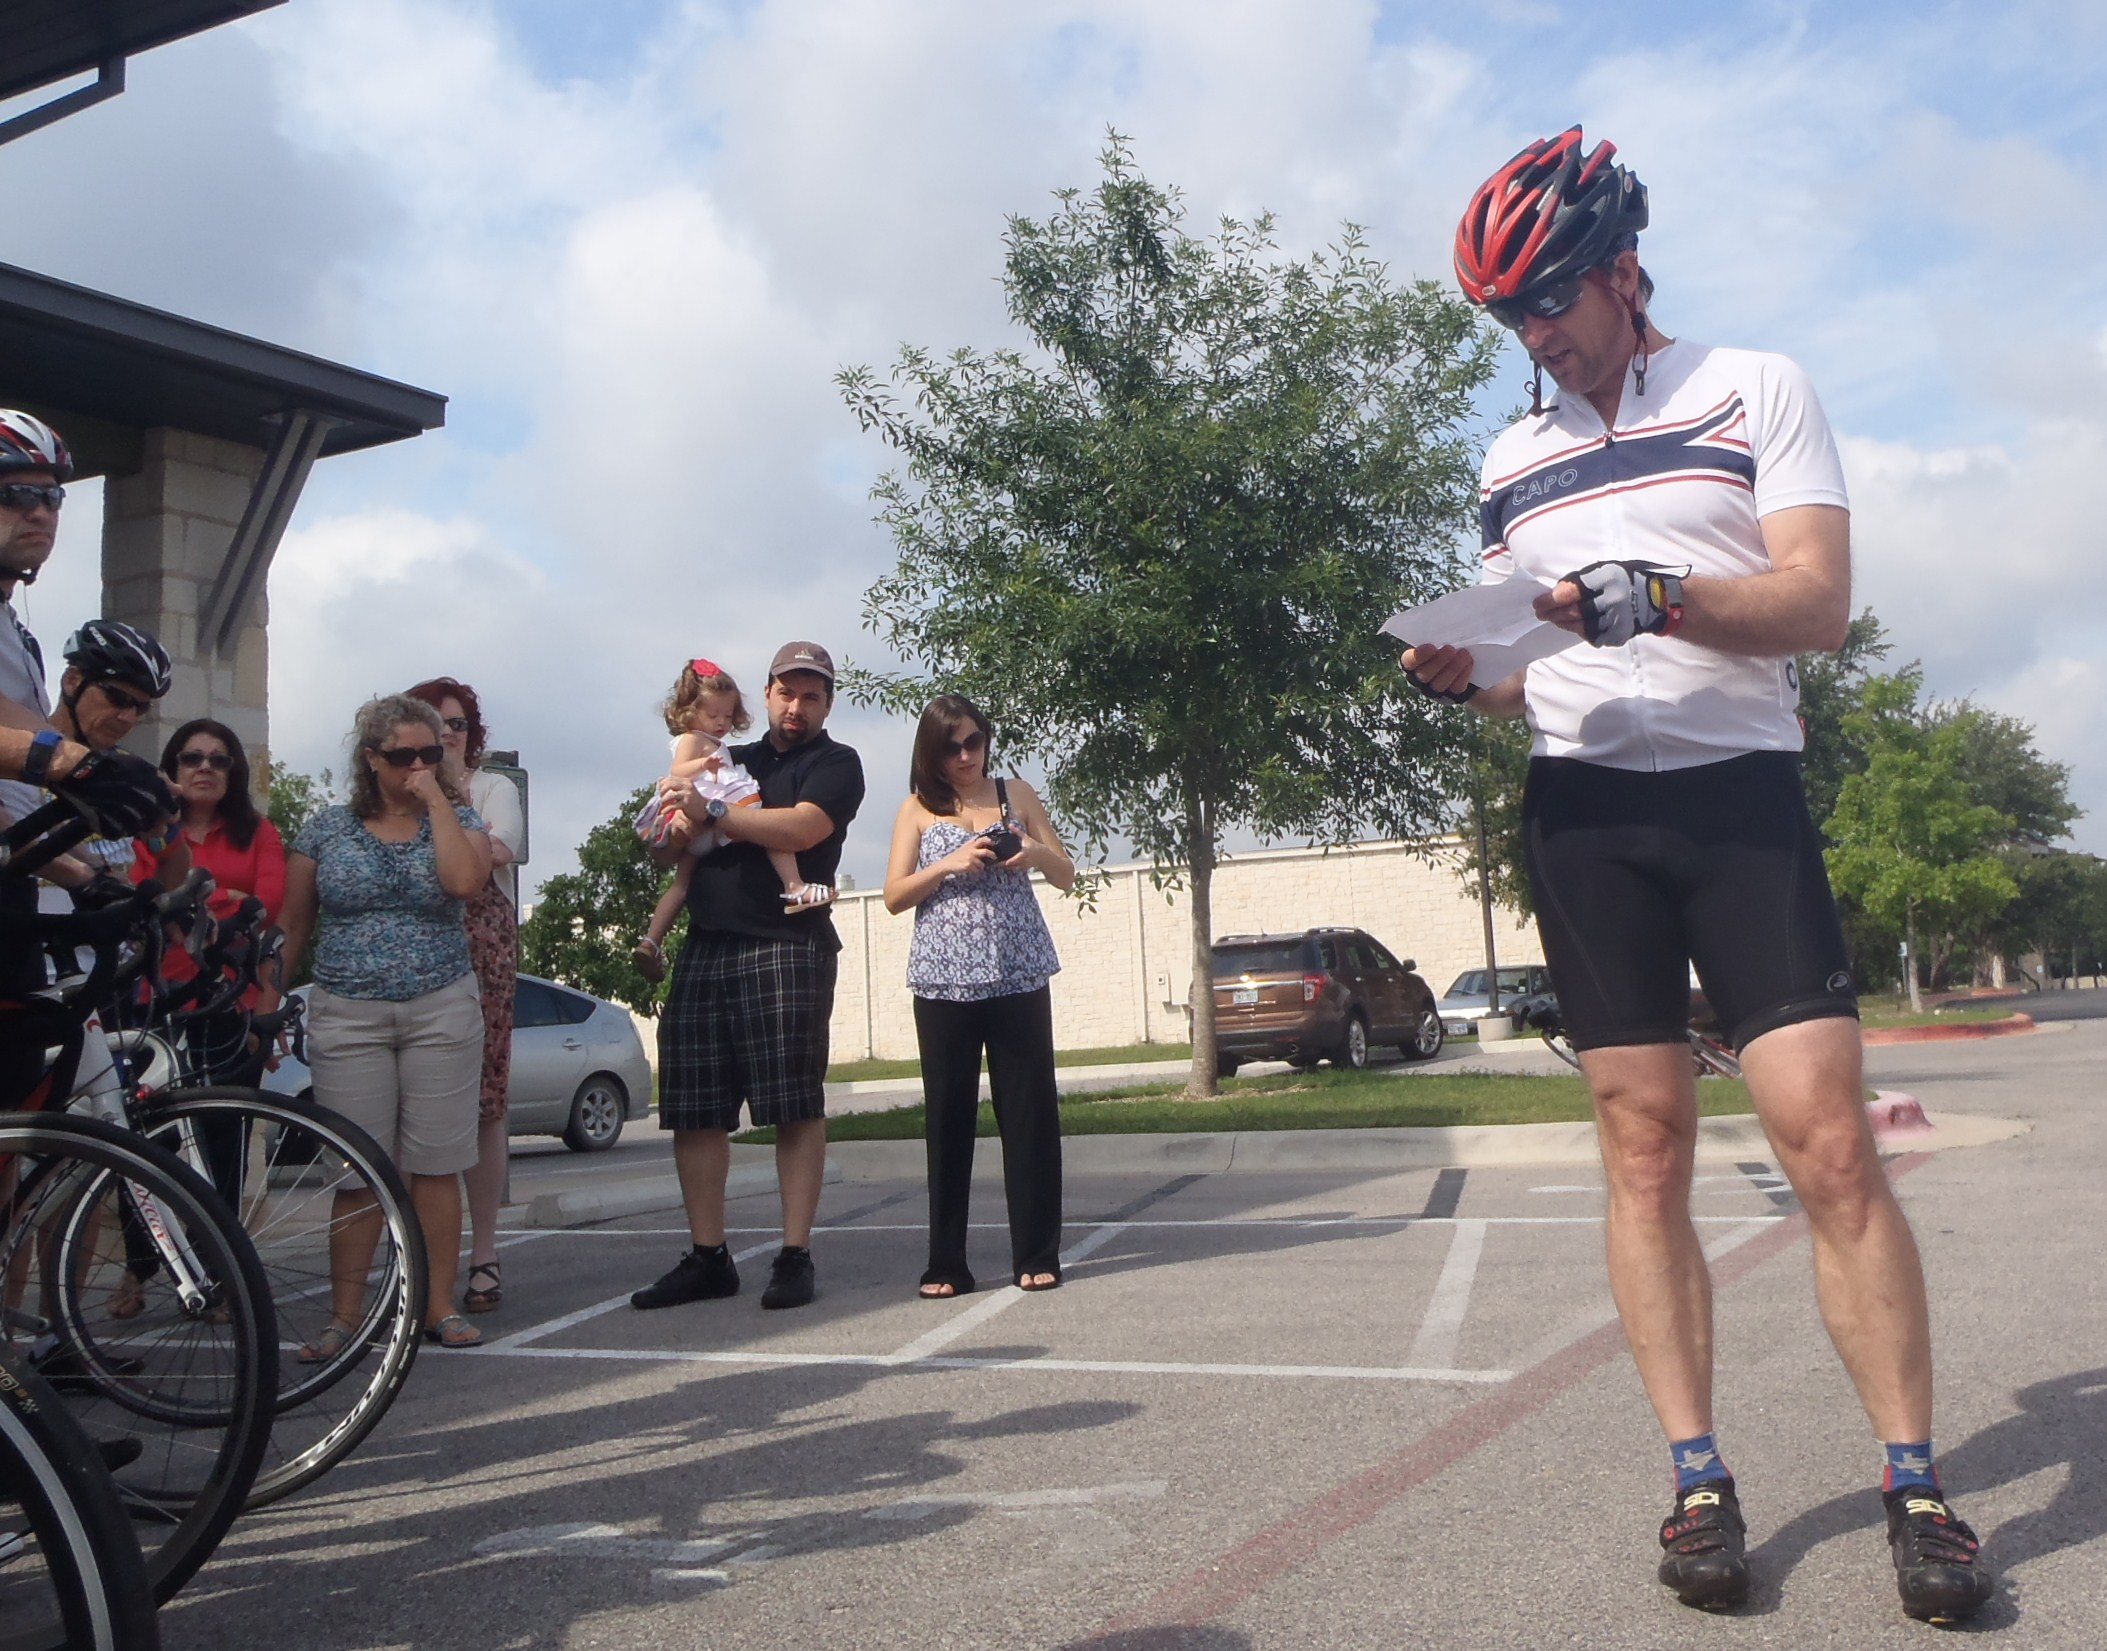 Cyclist Killed In Crash With Car In Southwest Austin